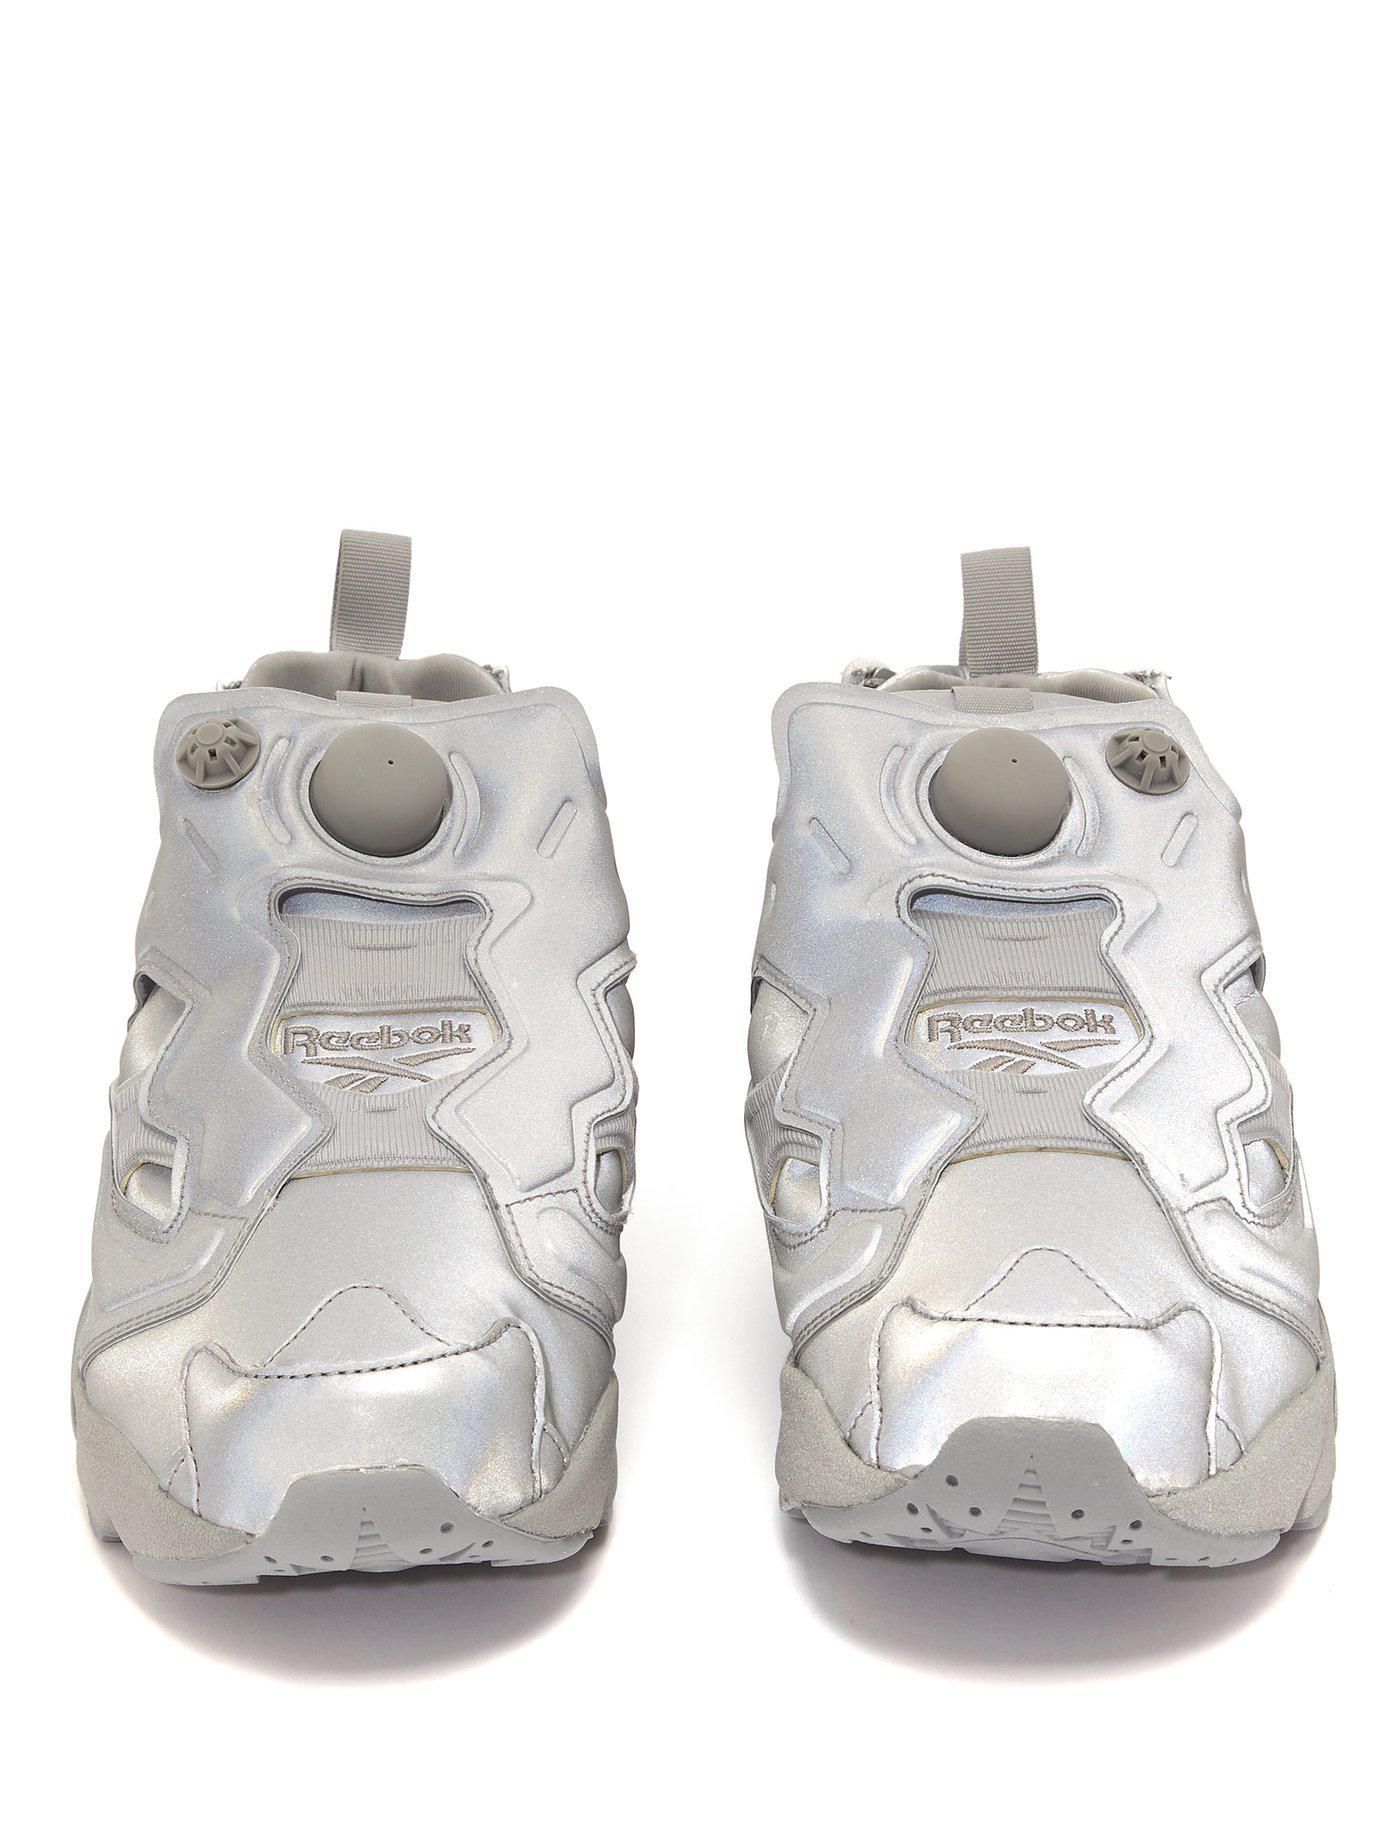 a10f41c45ca6 Vetements - Gray Reebok Instapump Fury Reflective Leather Sneakers - Lyst.  View fullscreen